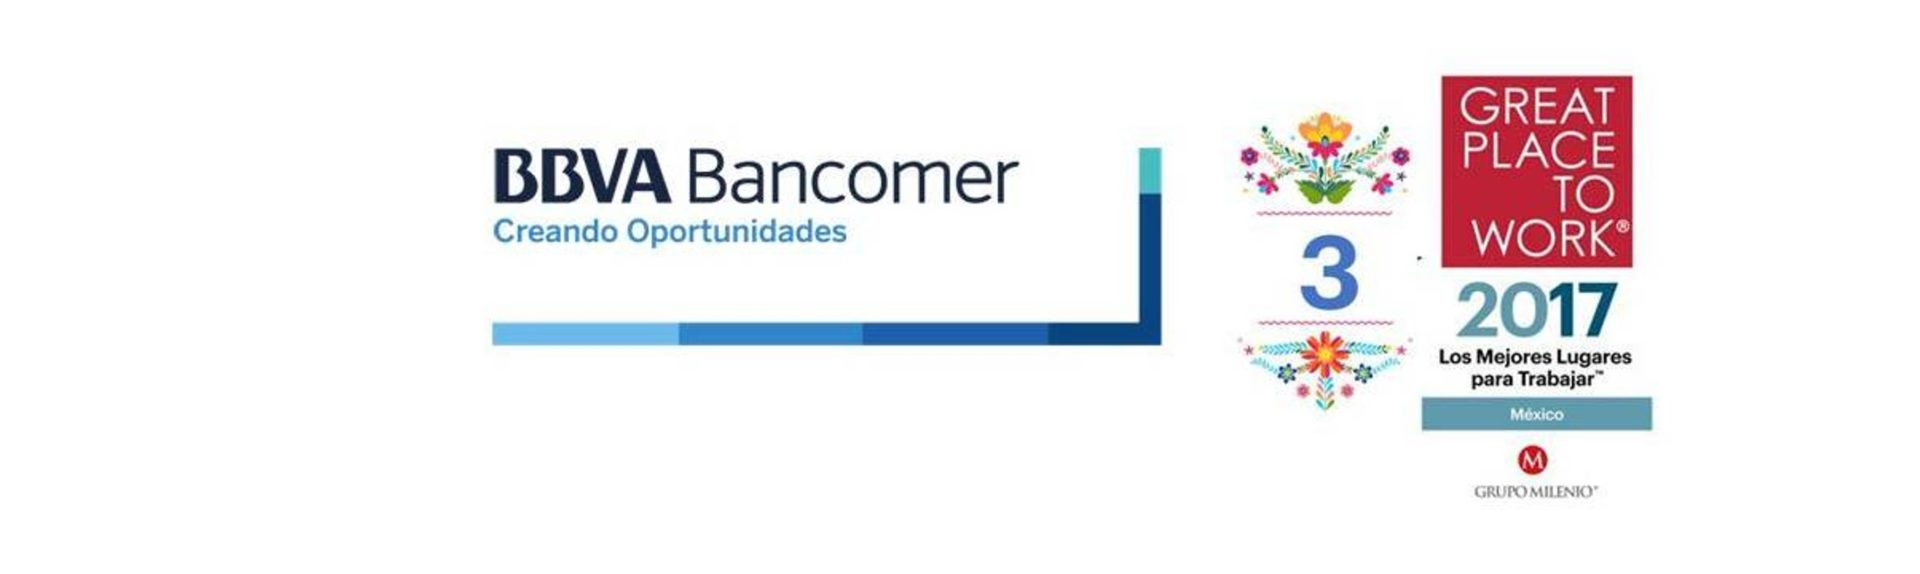 Bancomer tercer lugar en el Great Place to Work México